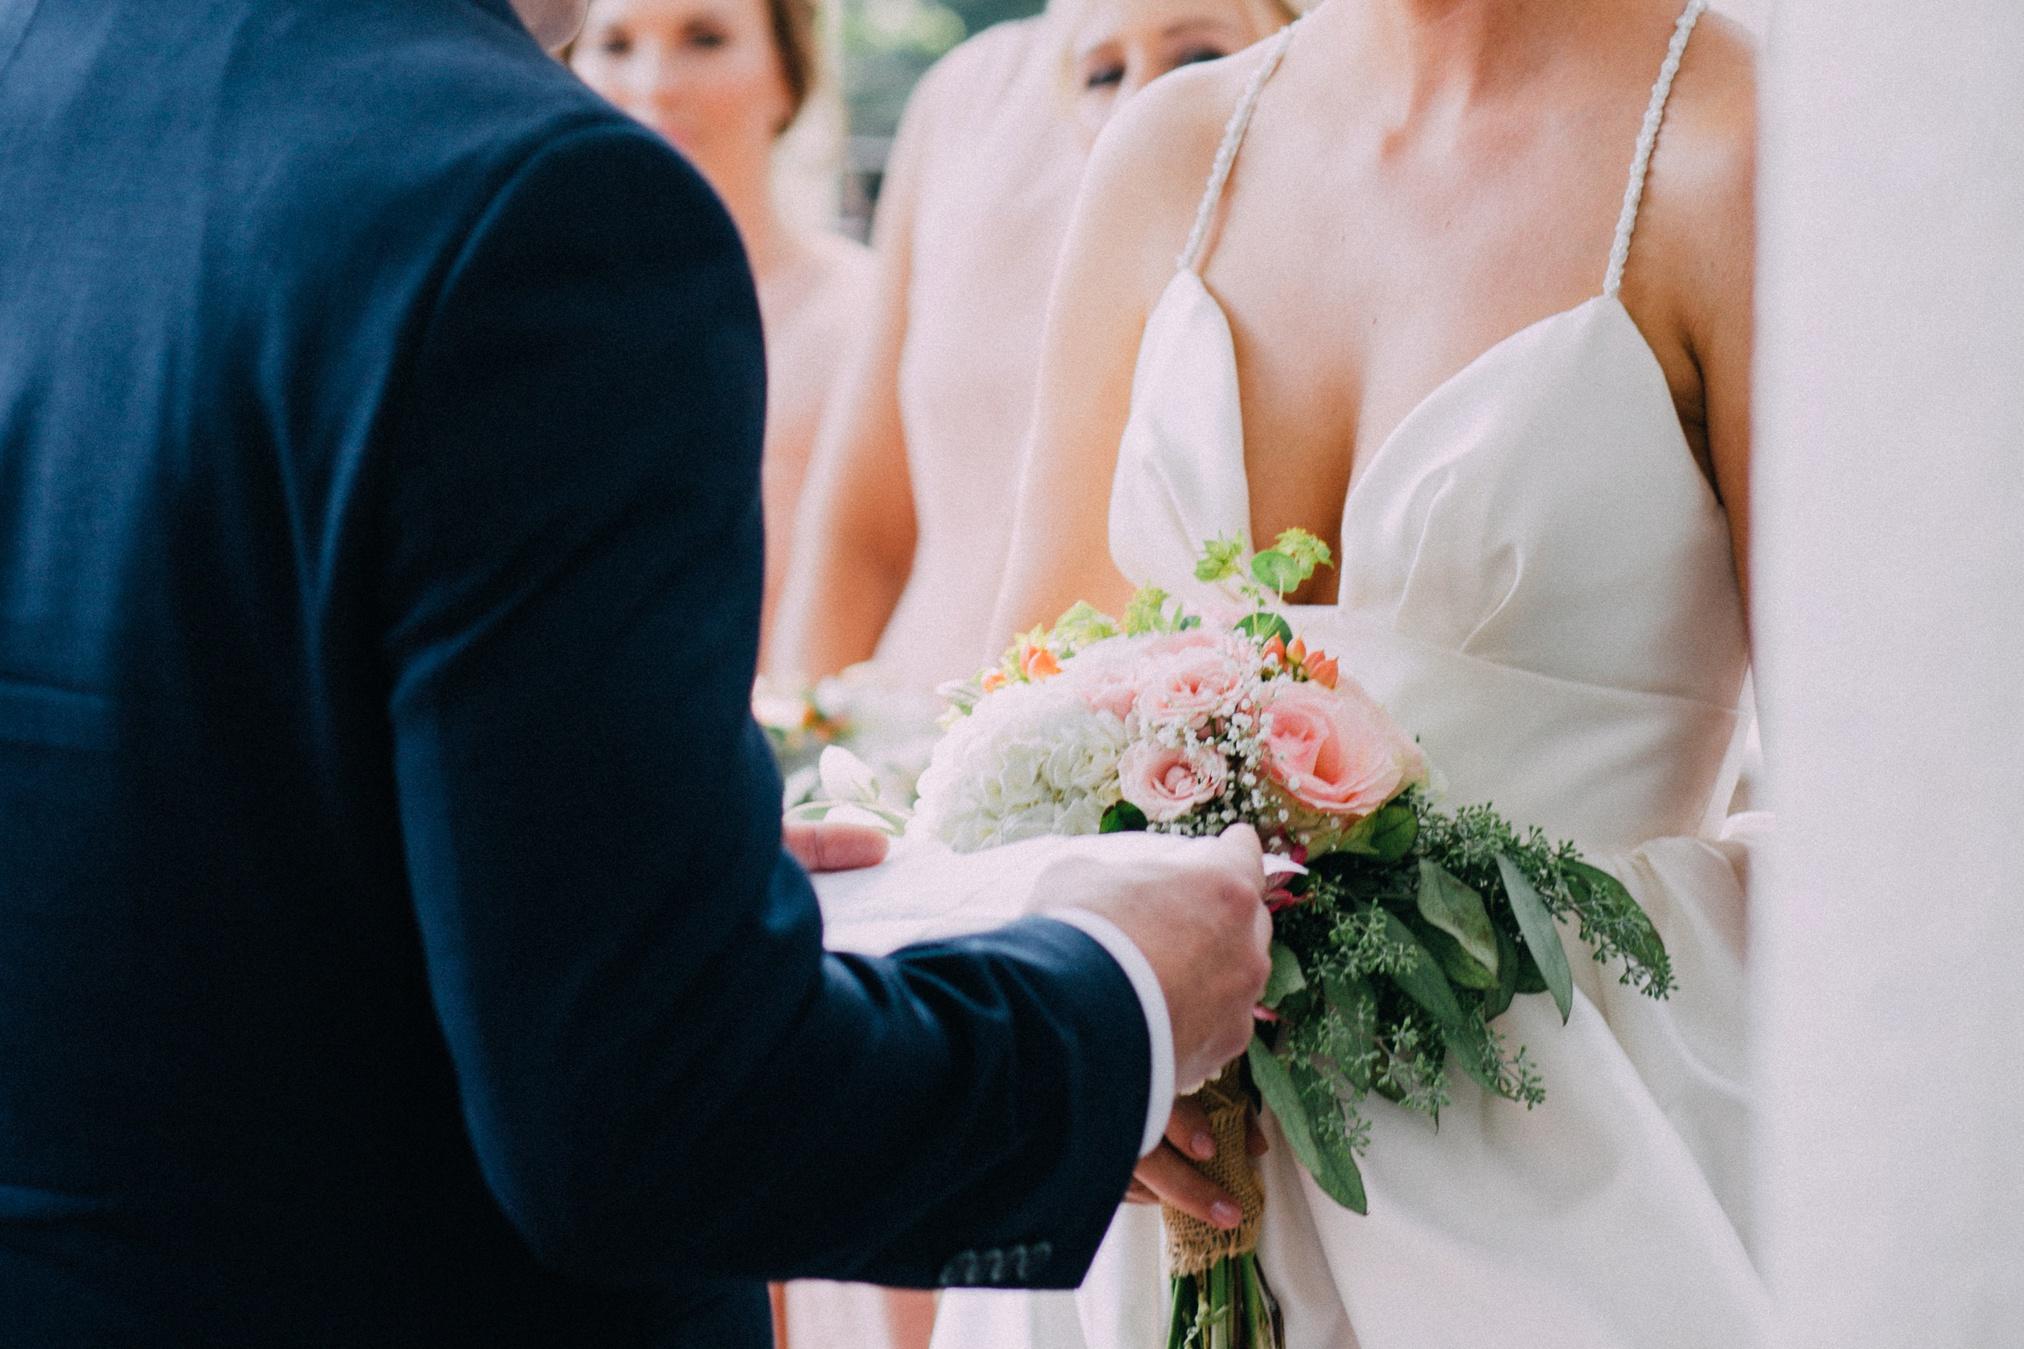 brenna+michael_wedding-421.jpg